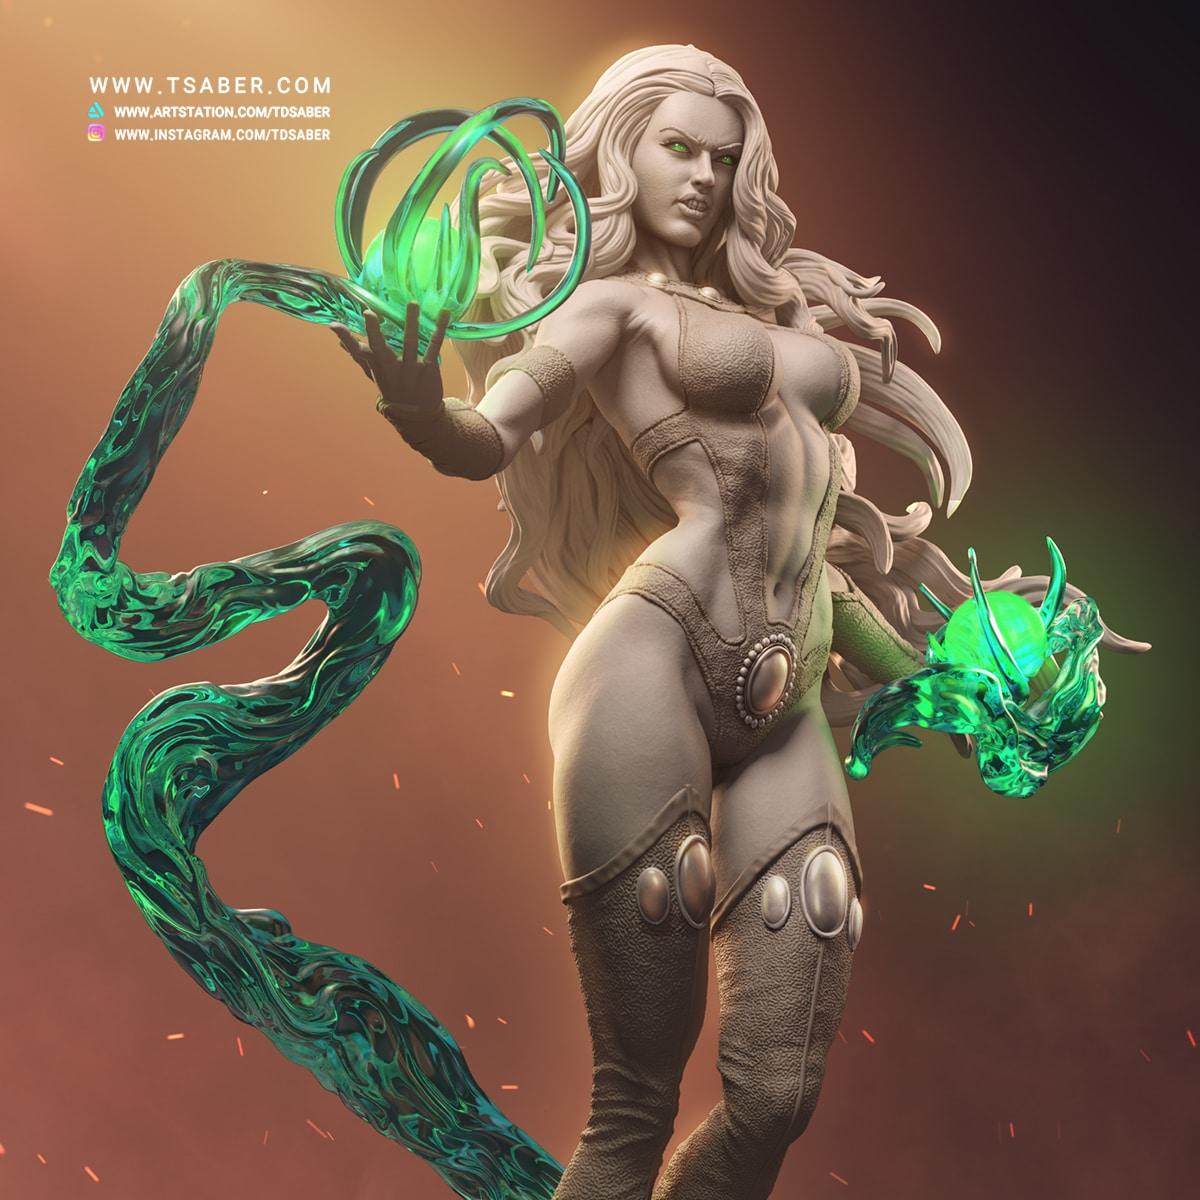 Starfire Zbrush Statue - DC Comics Teen Titans - Tsaber